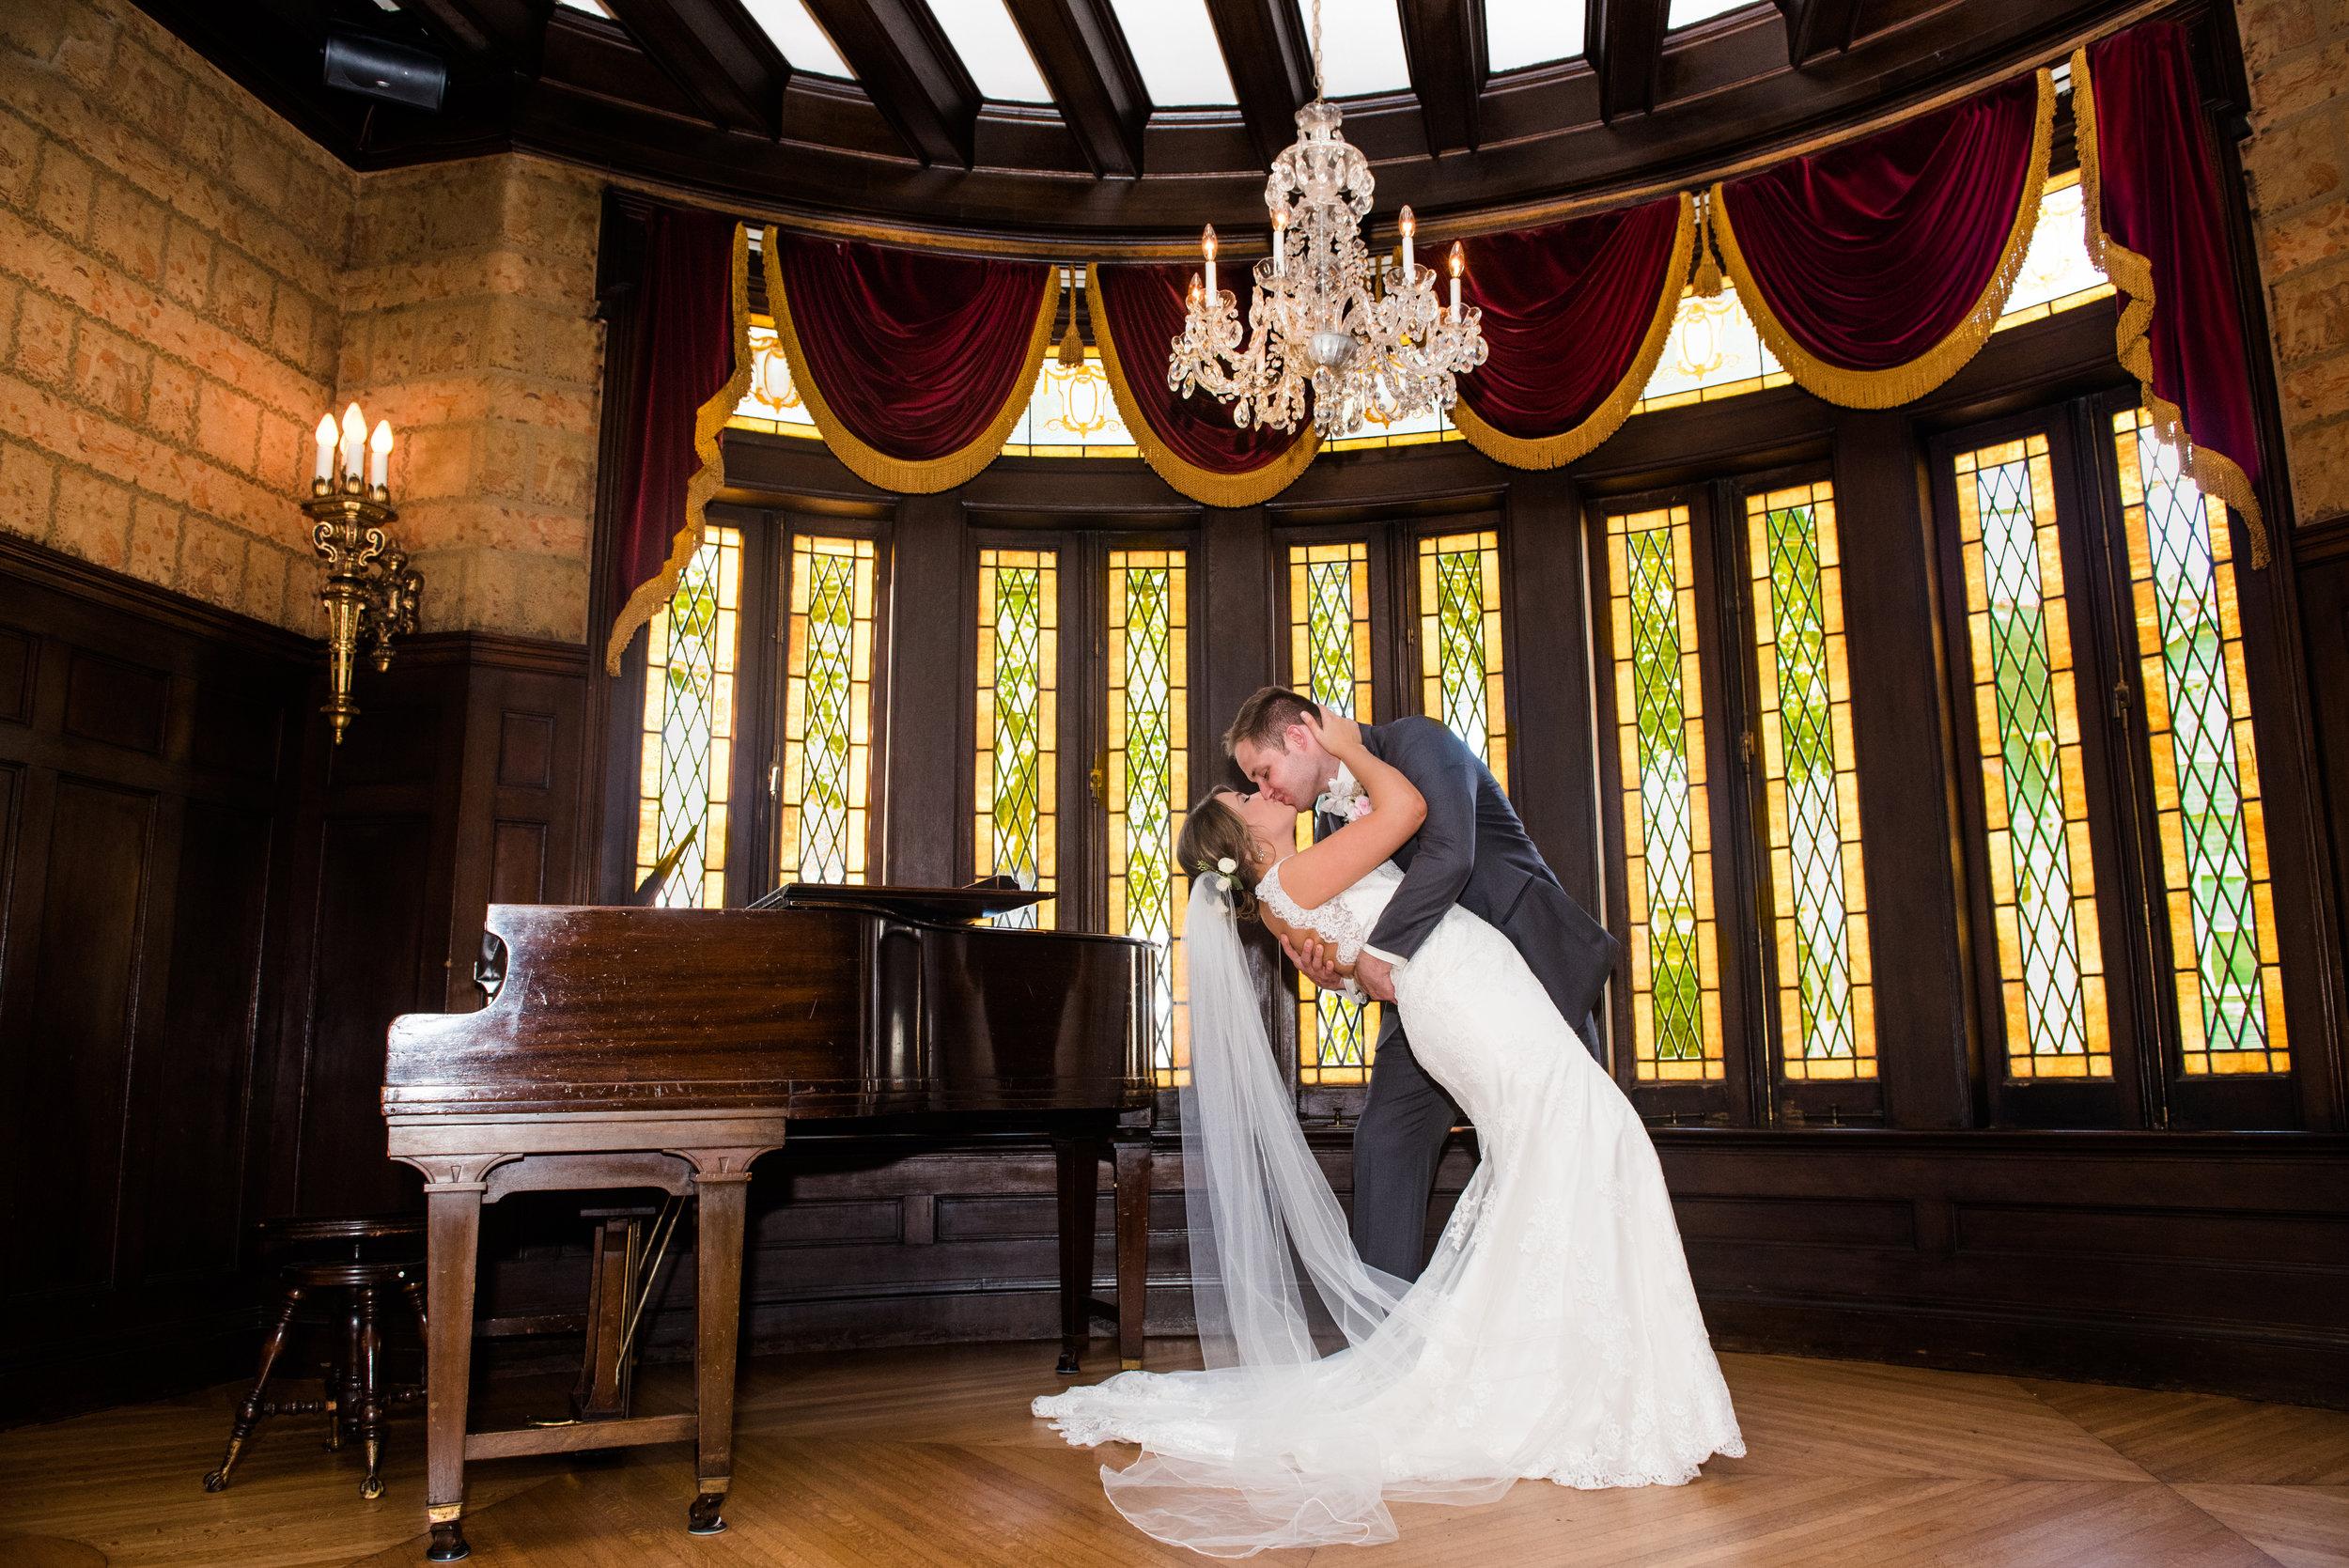 WEDDING WEDNESDAY | LAUREN B. | A NEW ORLEANS BRIDE